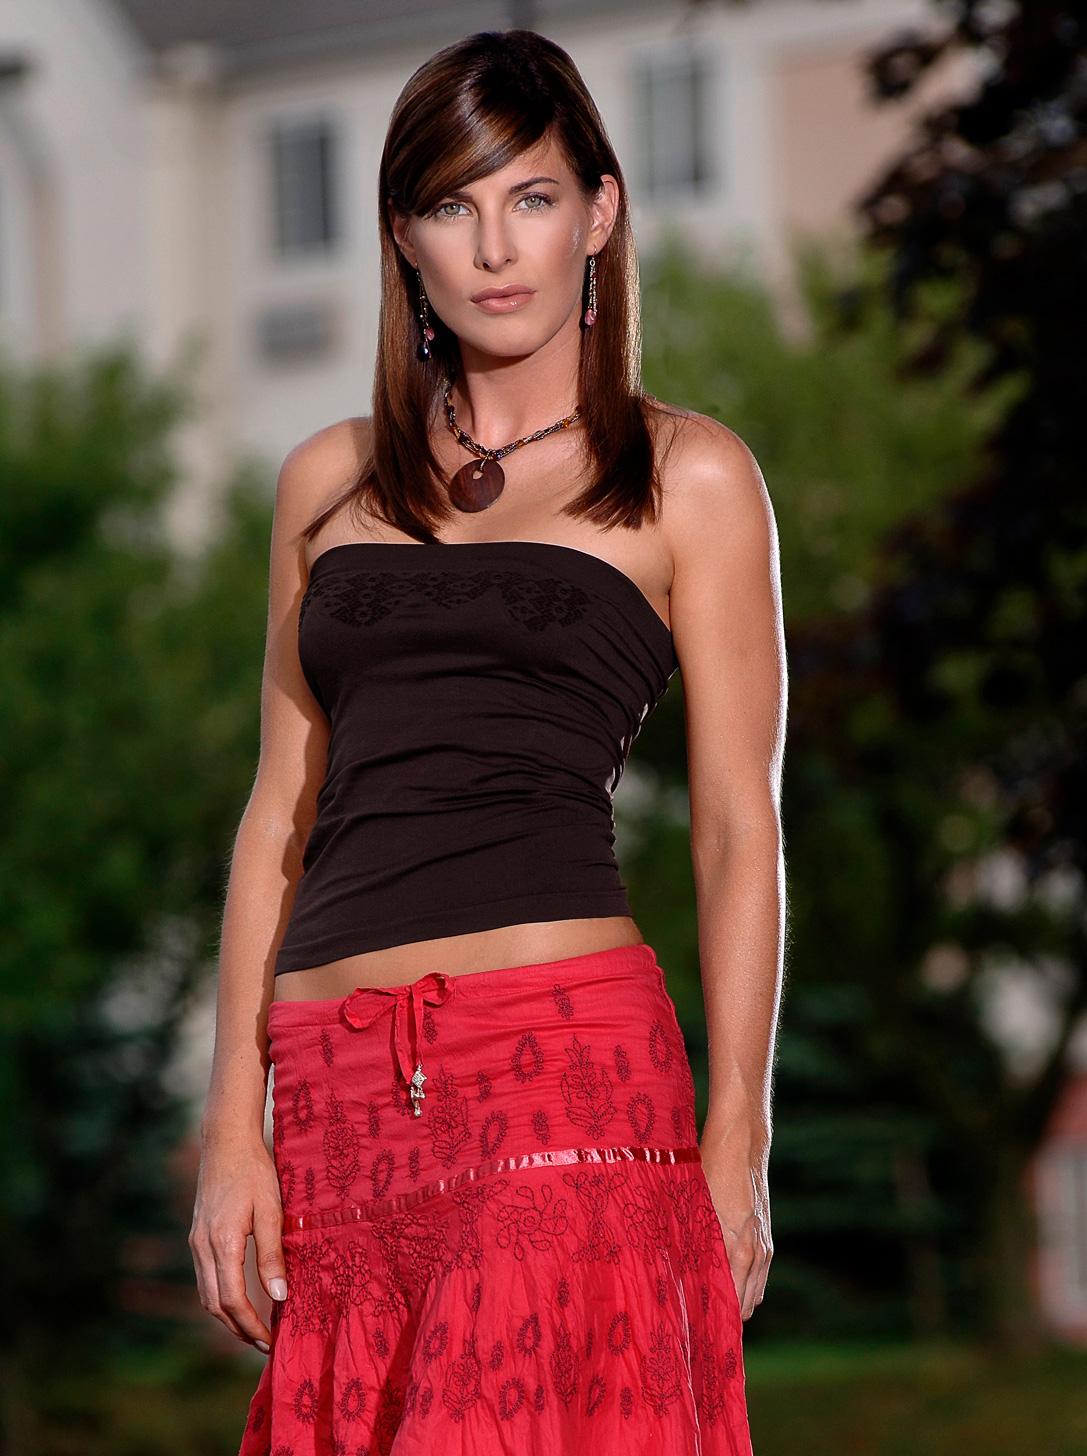 fashion photo of a professional model